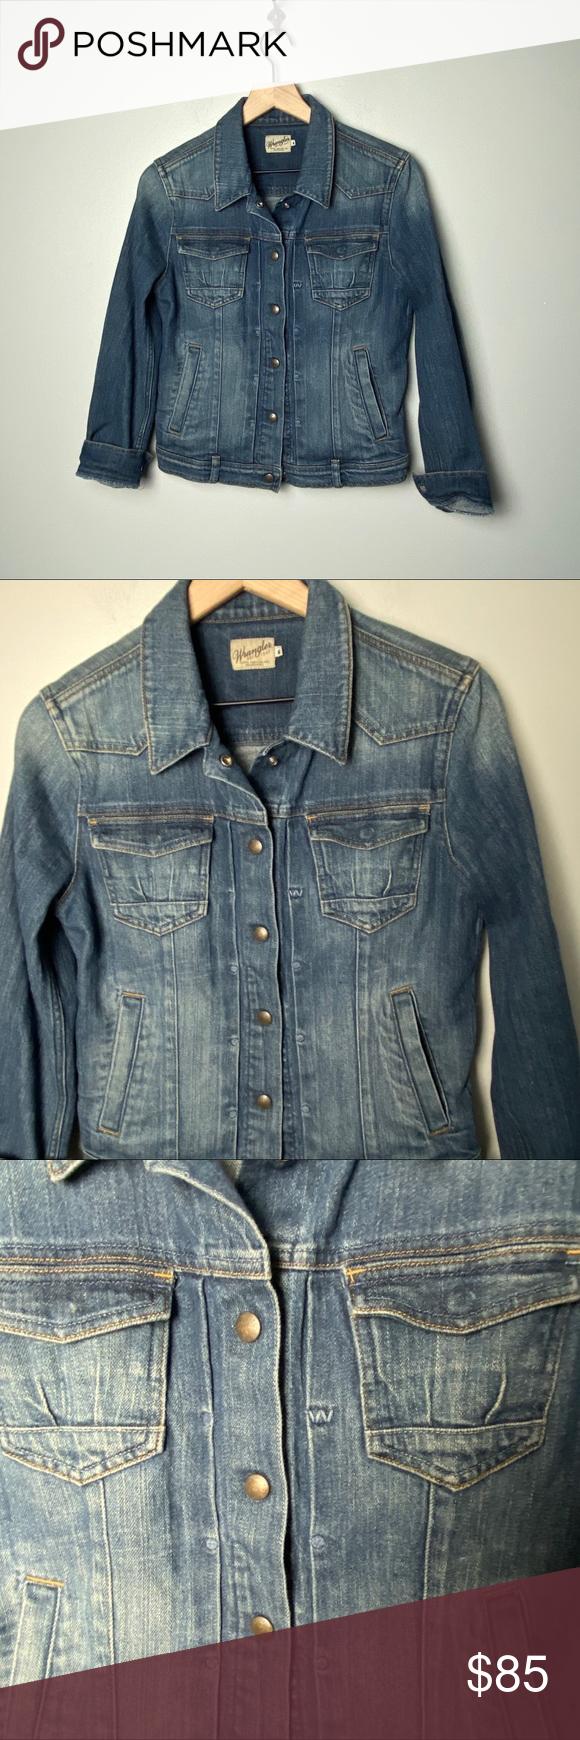 Wrangler Special Edition Premium Jean Jacket In M Wrangler Premium Jean Jacket Special Edition Throwb Premium Jeans Vintage Denim Jacket Vintage Wrangler Jeans [ 1740 x 580 Pixel ]